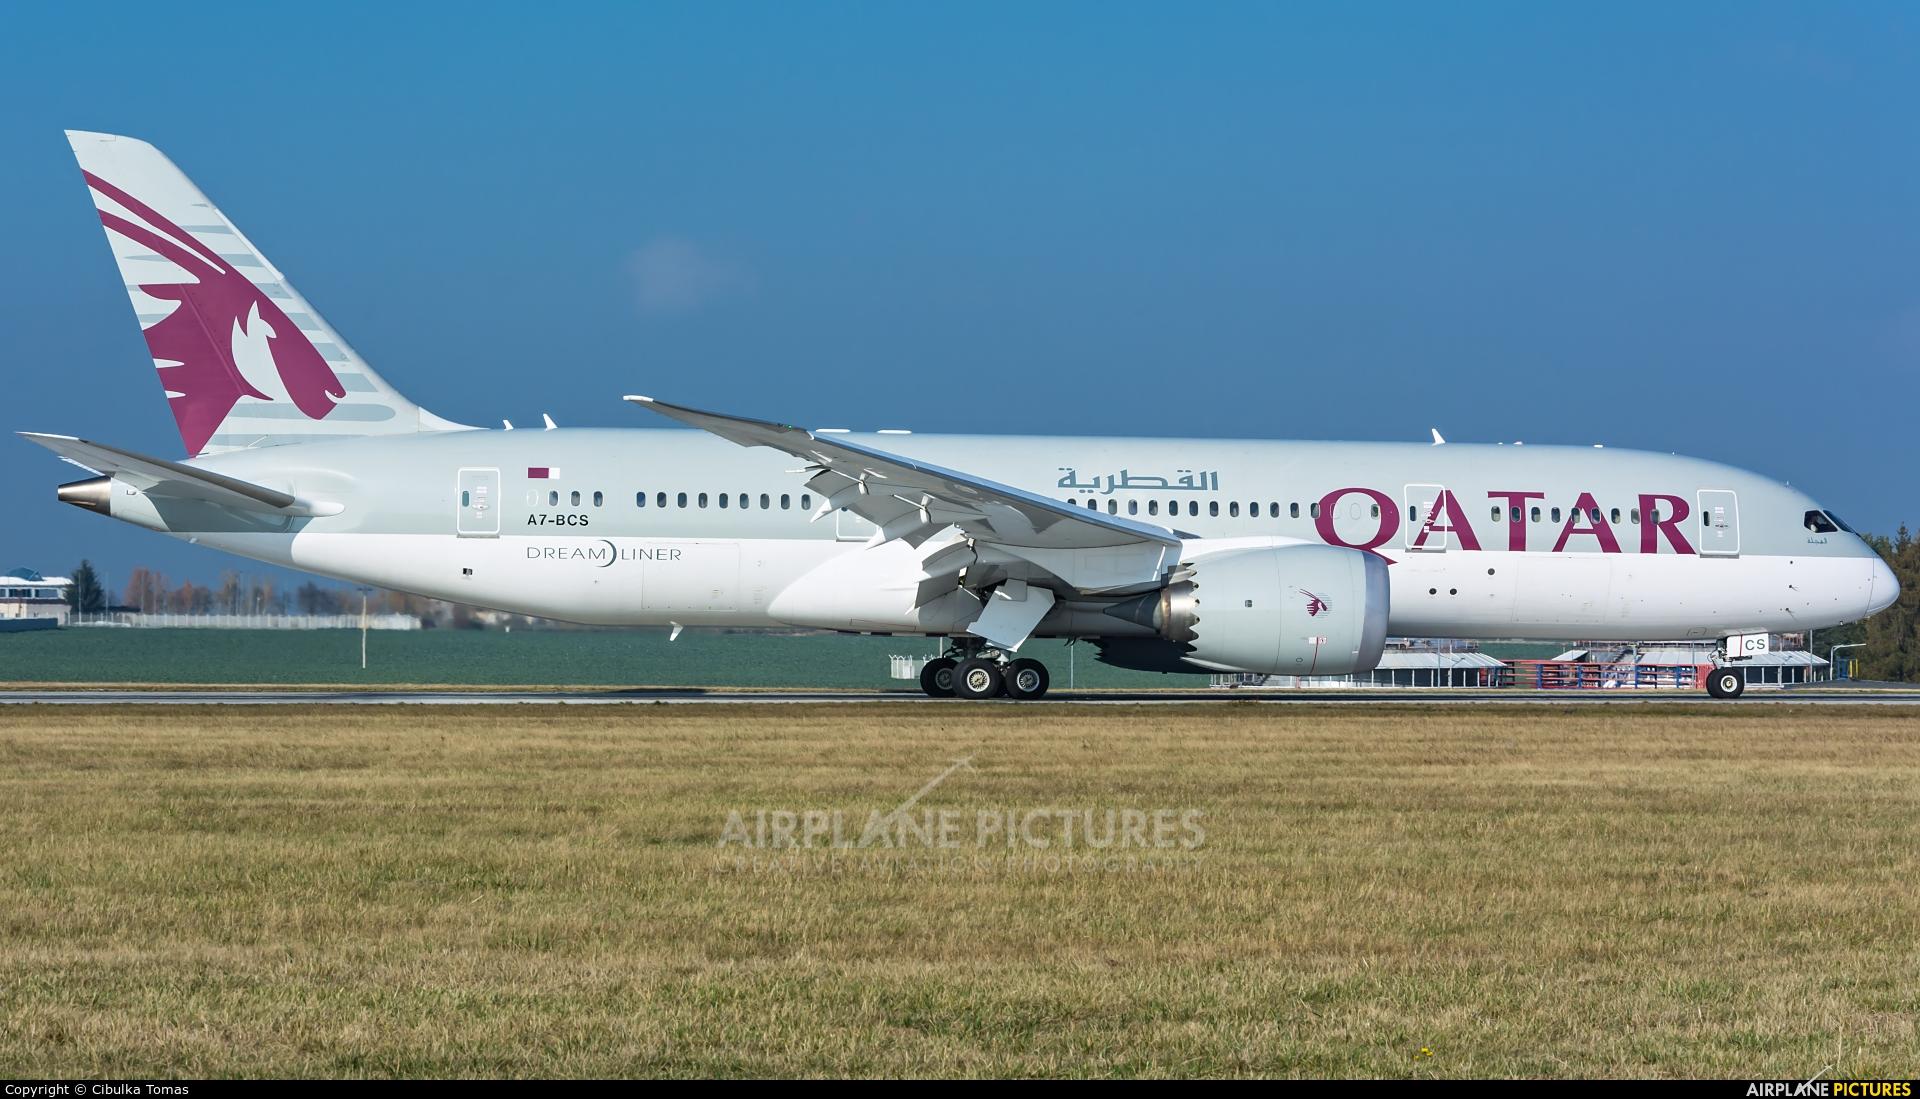 Qatar Airways A7-BCS aircraft at Prague - Václav Havel